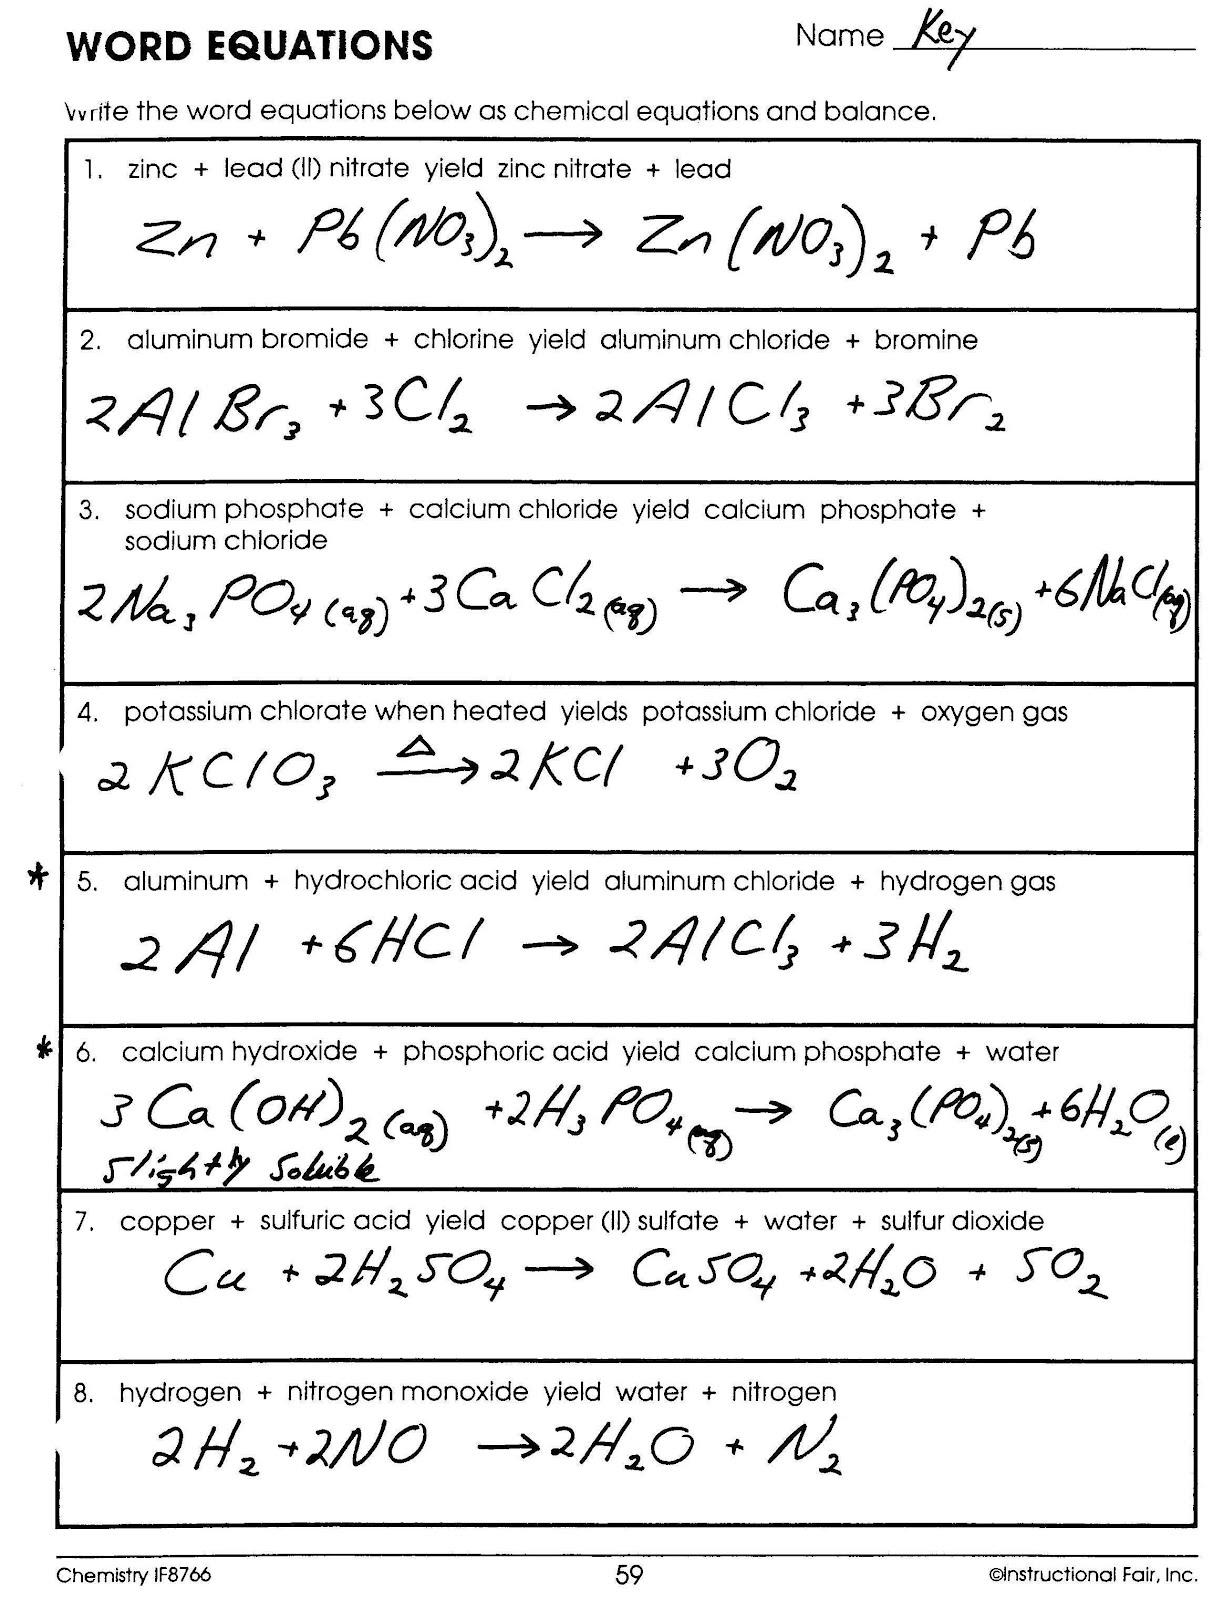 Chemistry Word Equations Worksheet The Best Worksheets Image